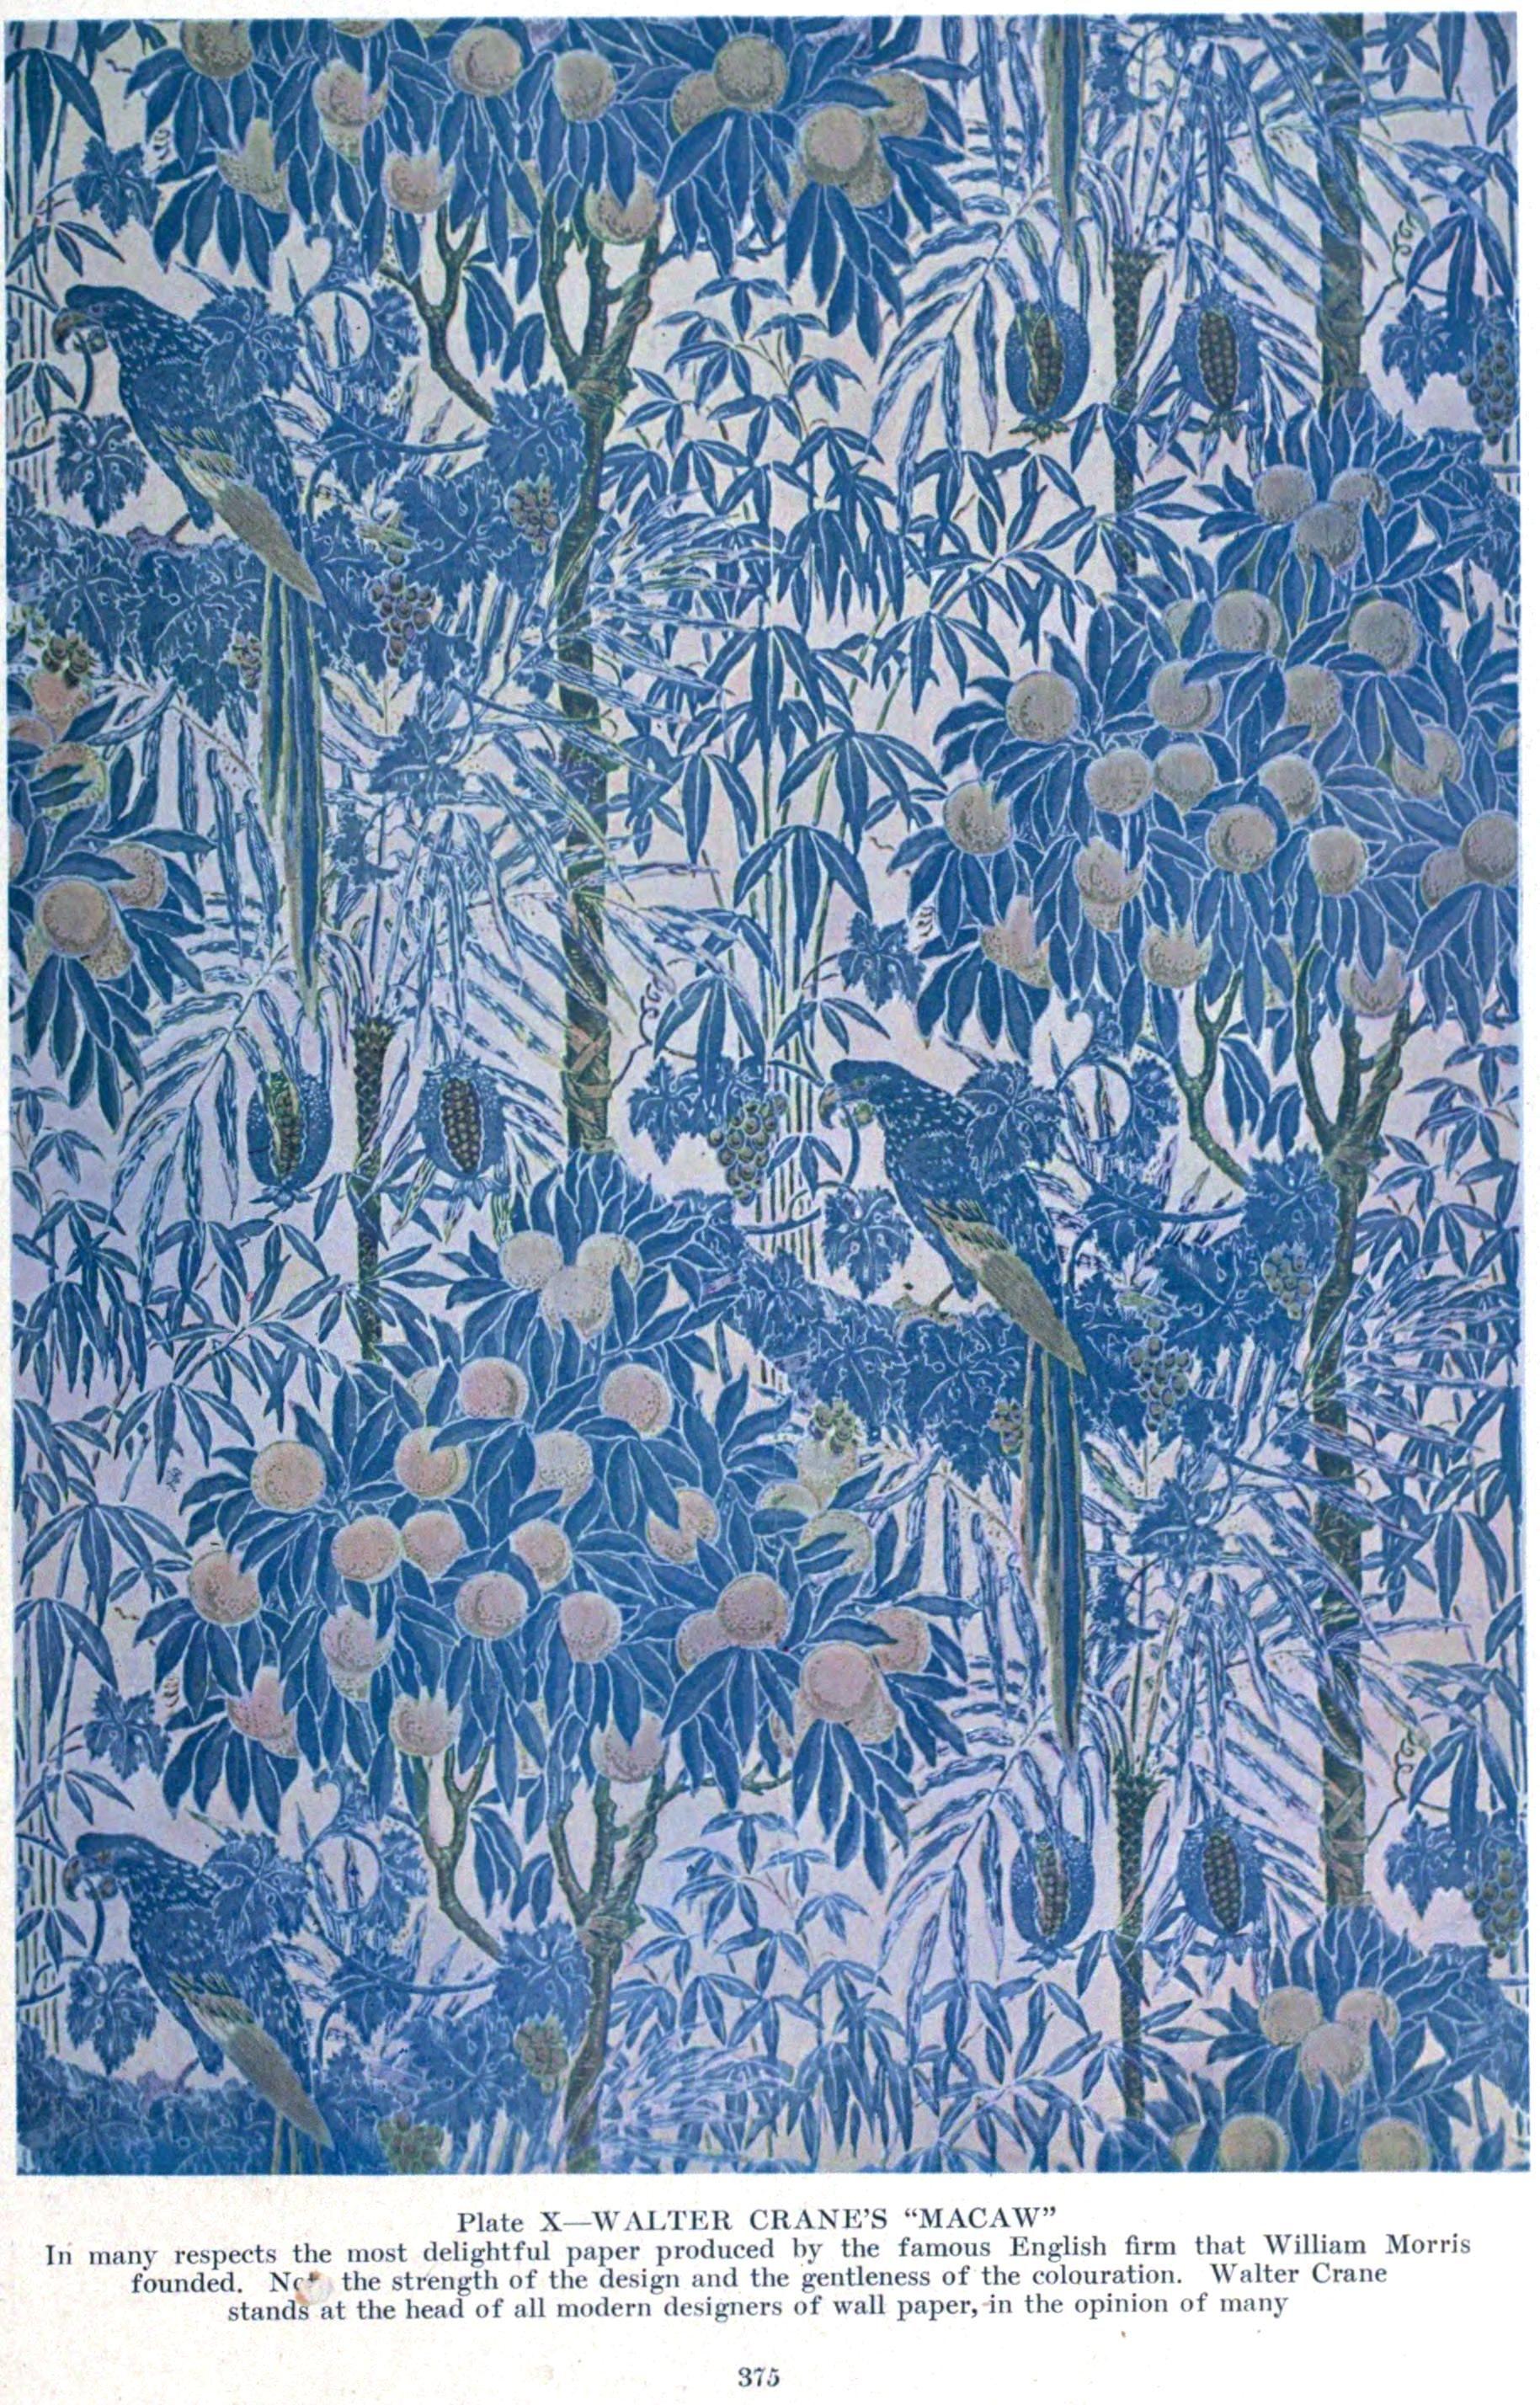 pingl par auguste le chat sur pattern textile illustration. Black Bedroom Furniture Sets. Home Design Ideas